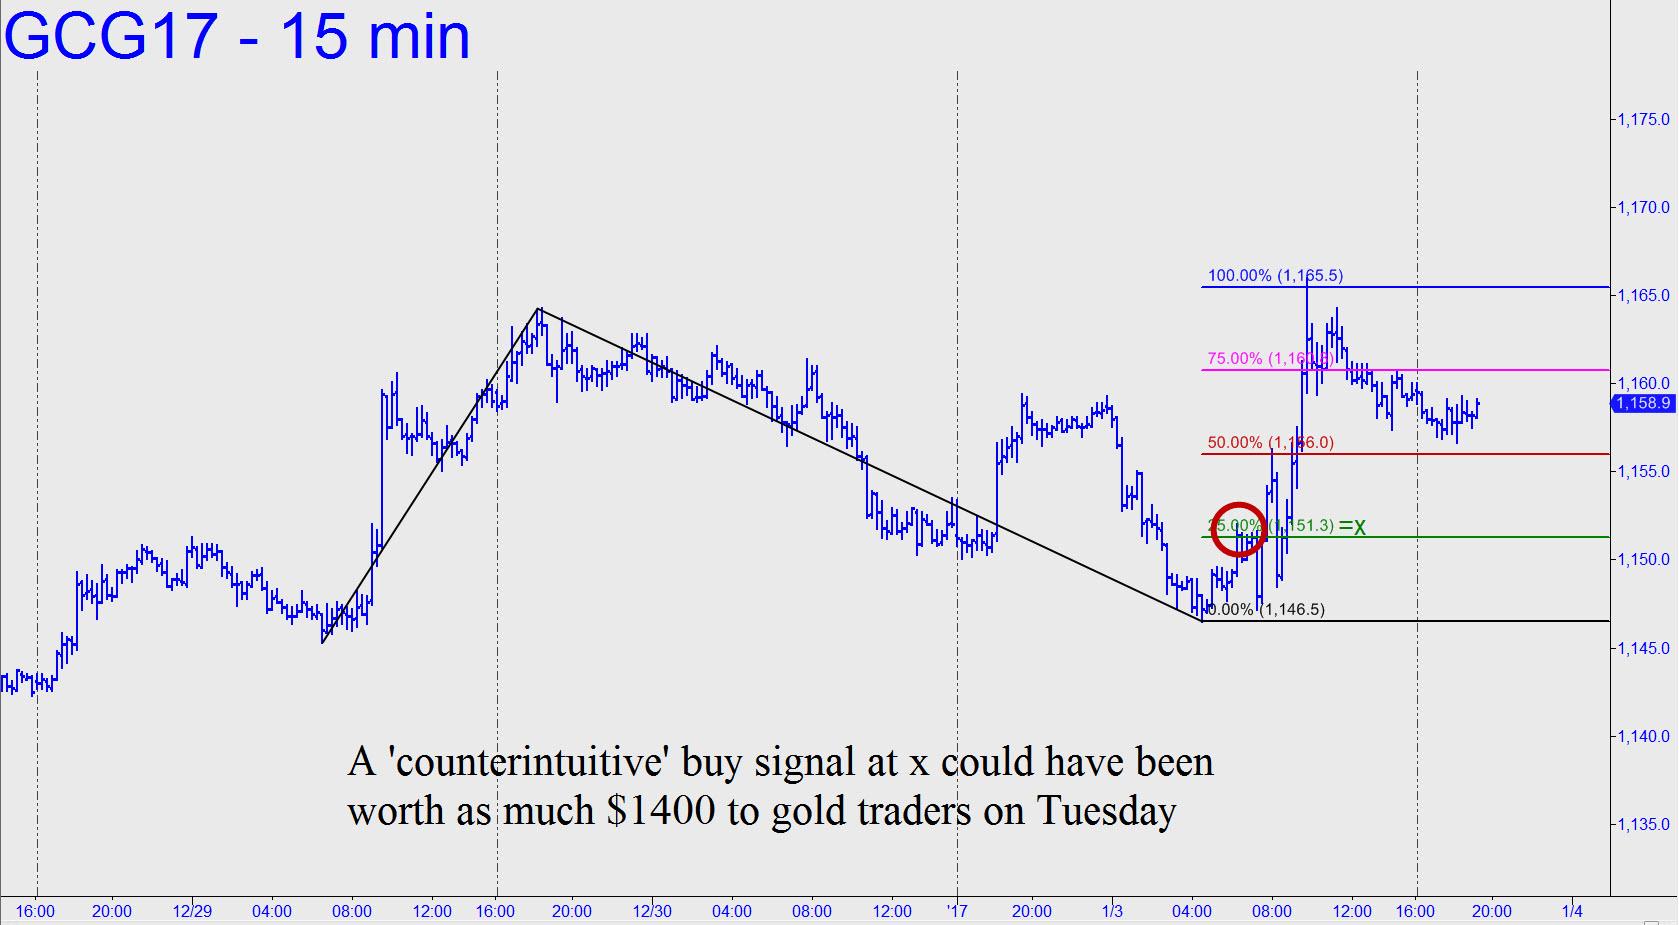 http://www.rickackerman.com/wp-content/uploads/2017/01/Counterintuitive-buy-signal-in-gold.jpg